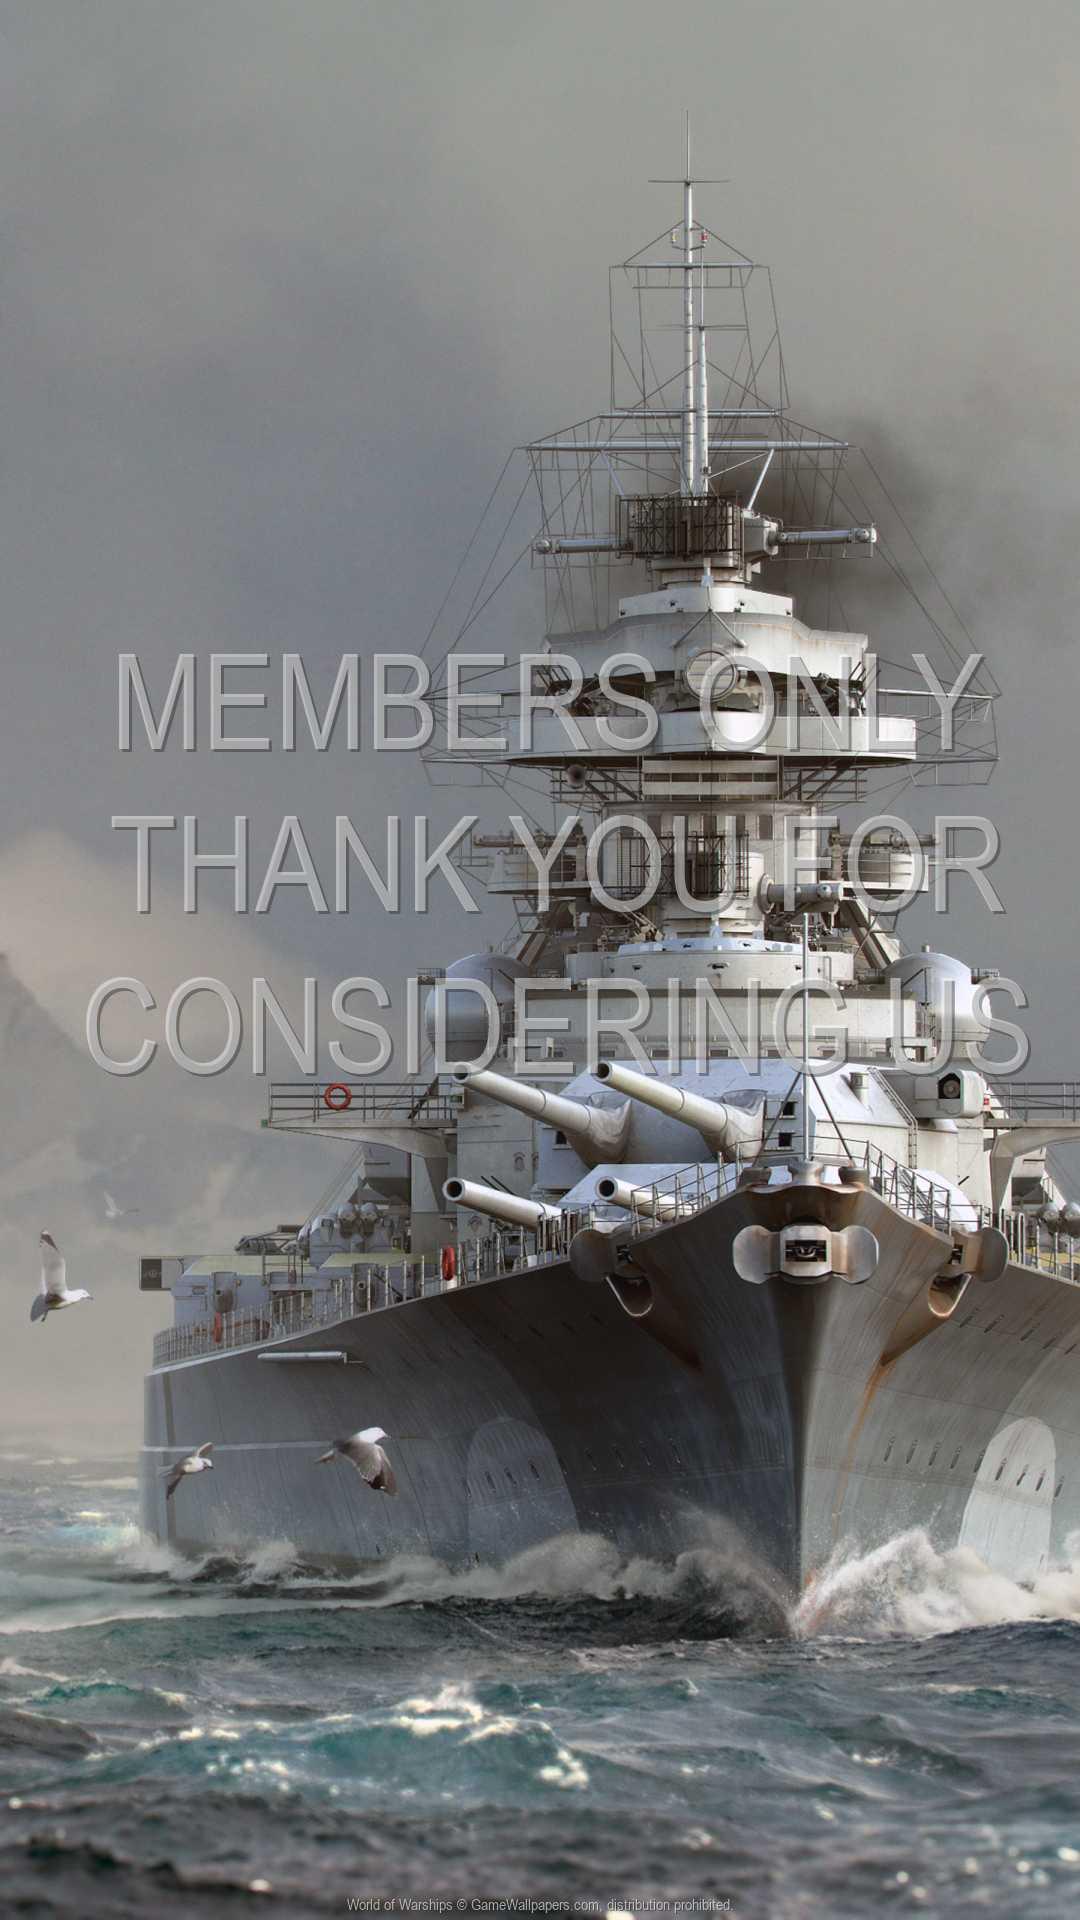 World of Warships 1080p Vertical Handy Hintergrundbild 16